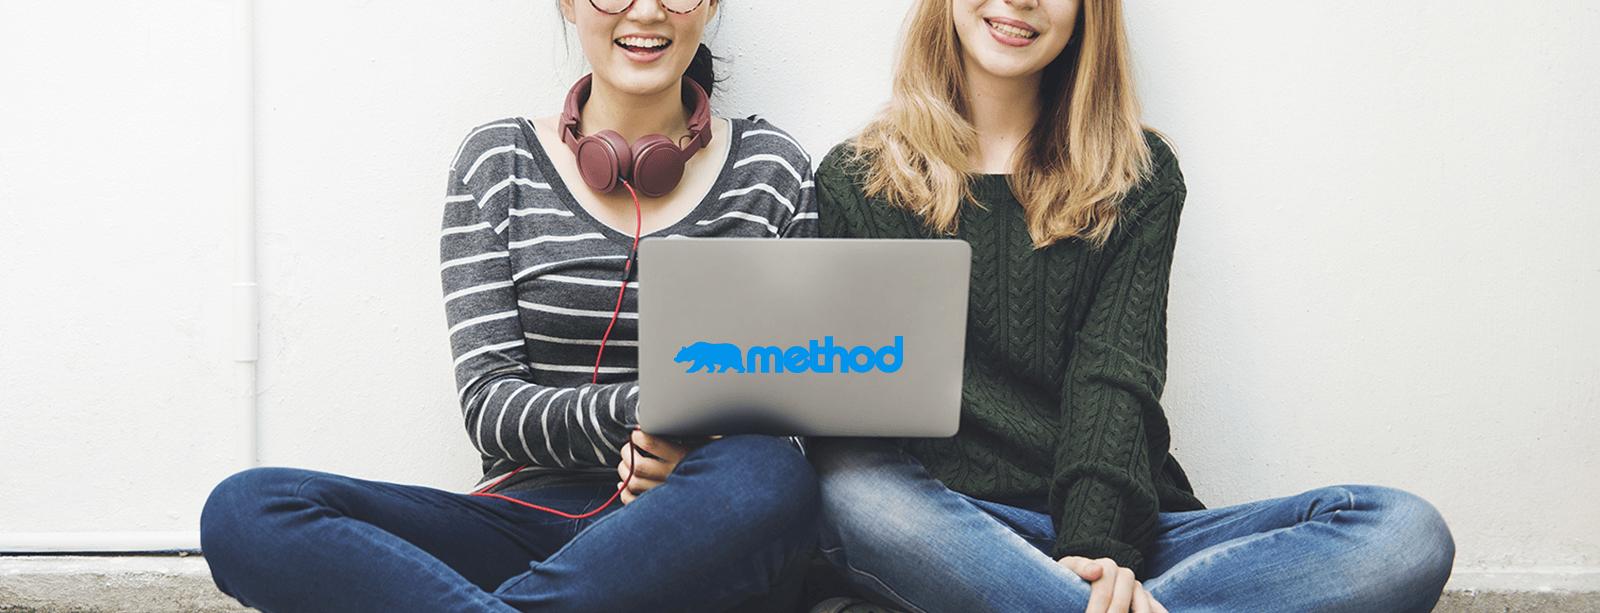 method-students-online.png